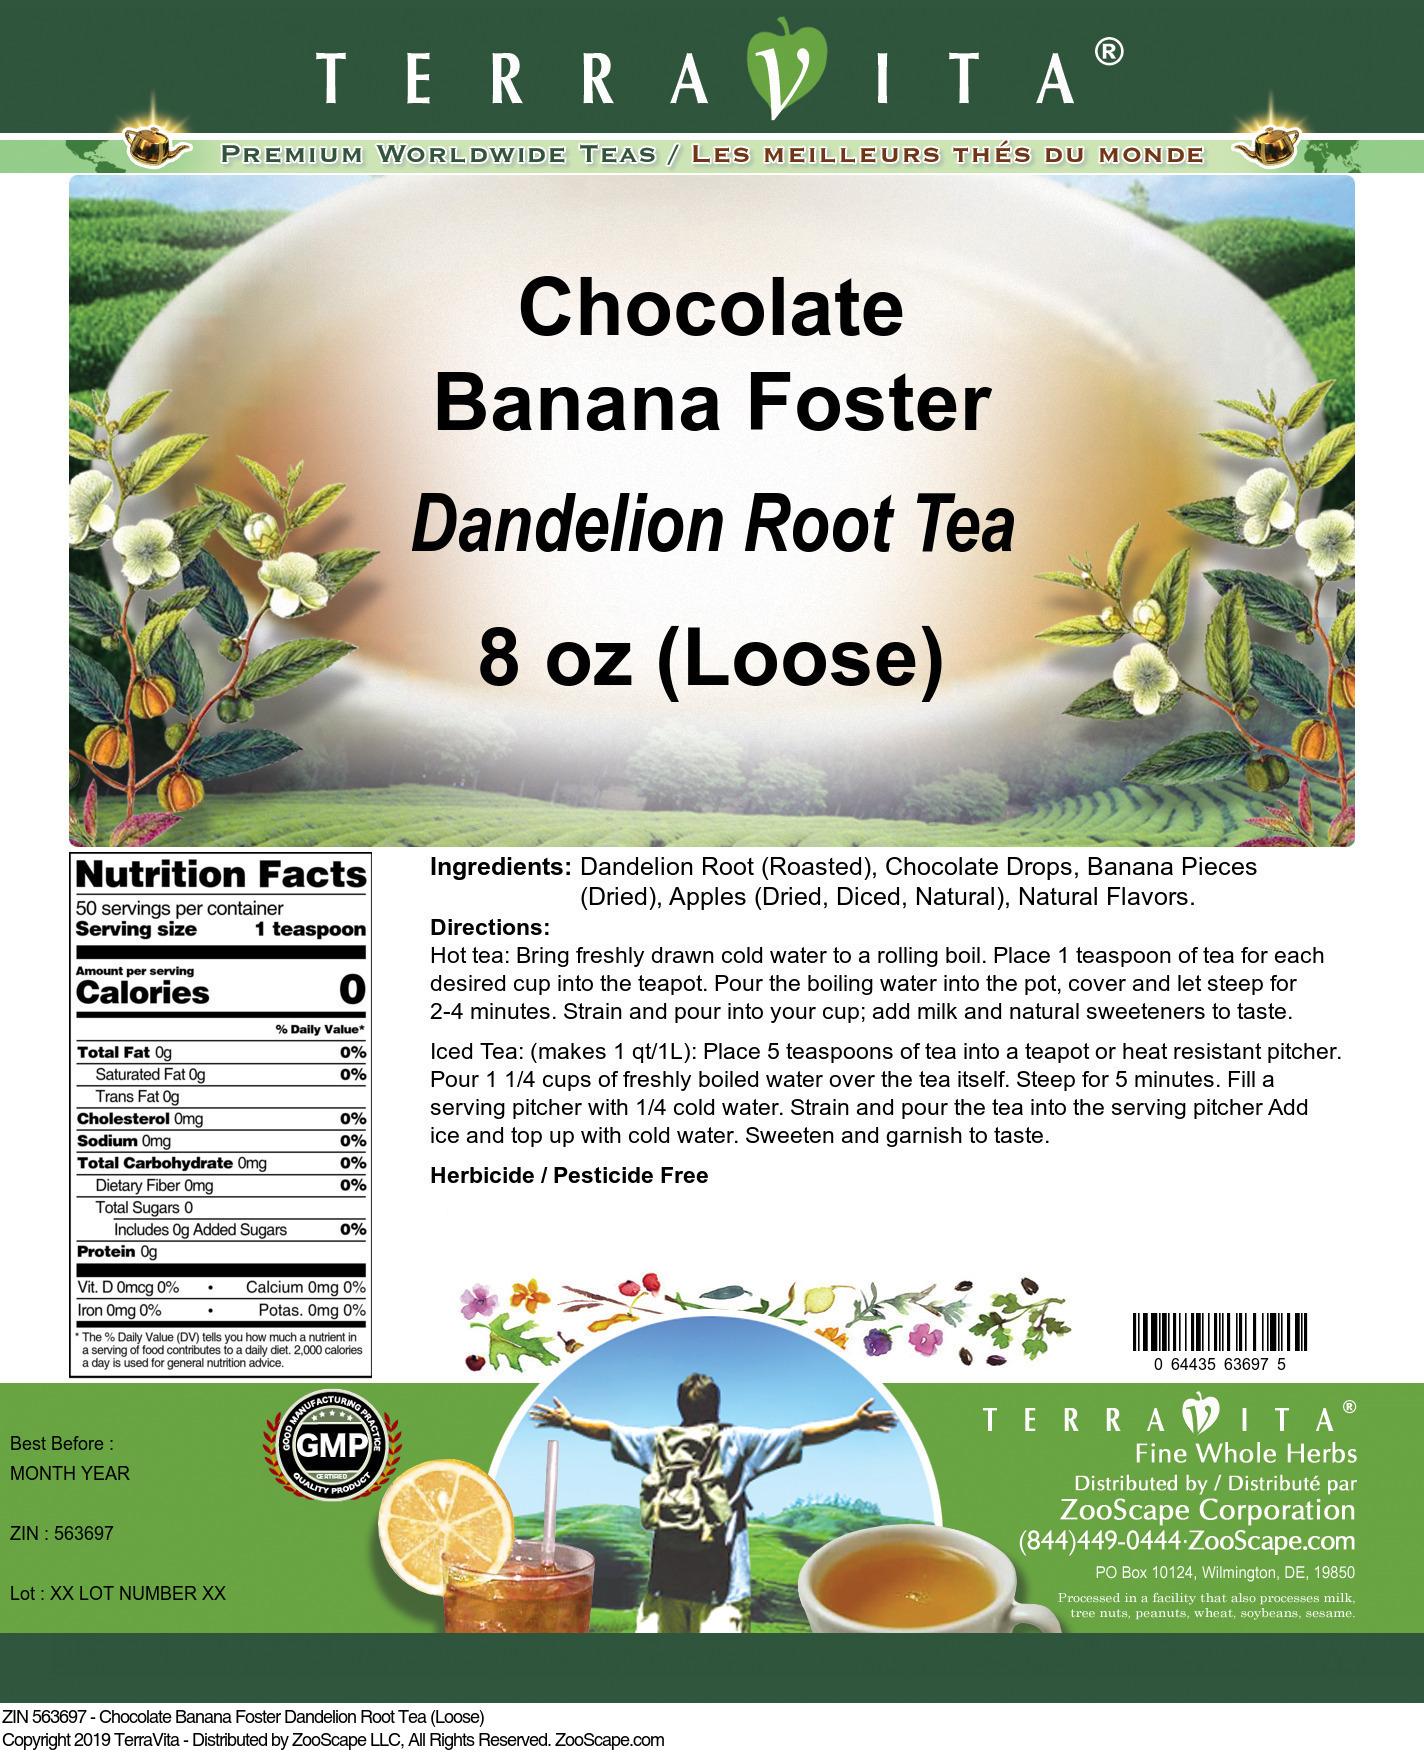 Chocolate Banana Foster Dandelion Root Tea (Loose)